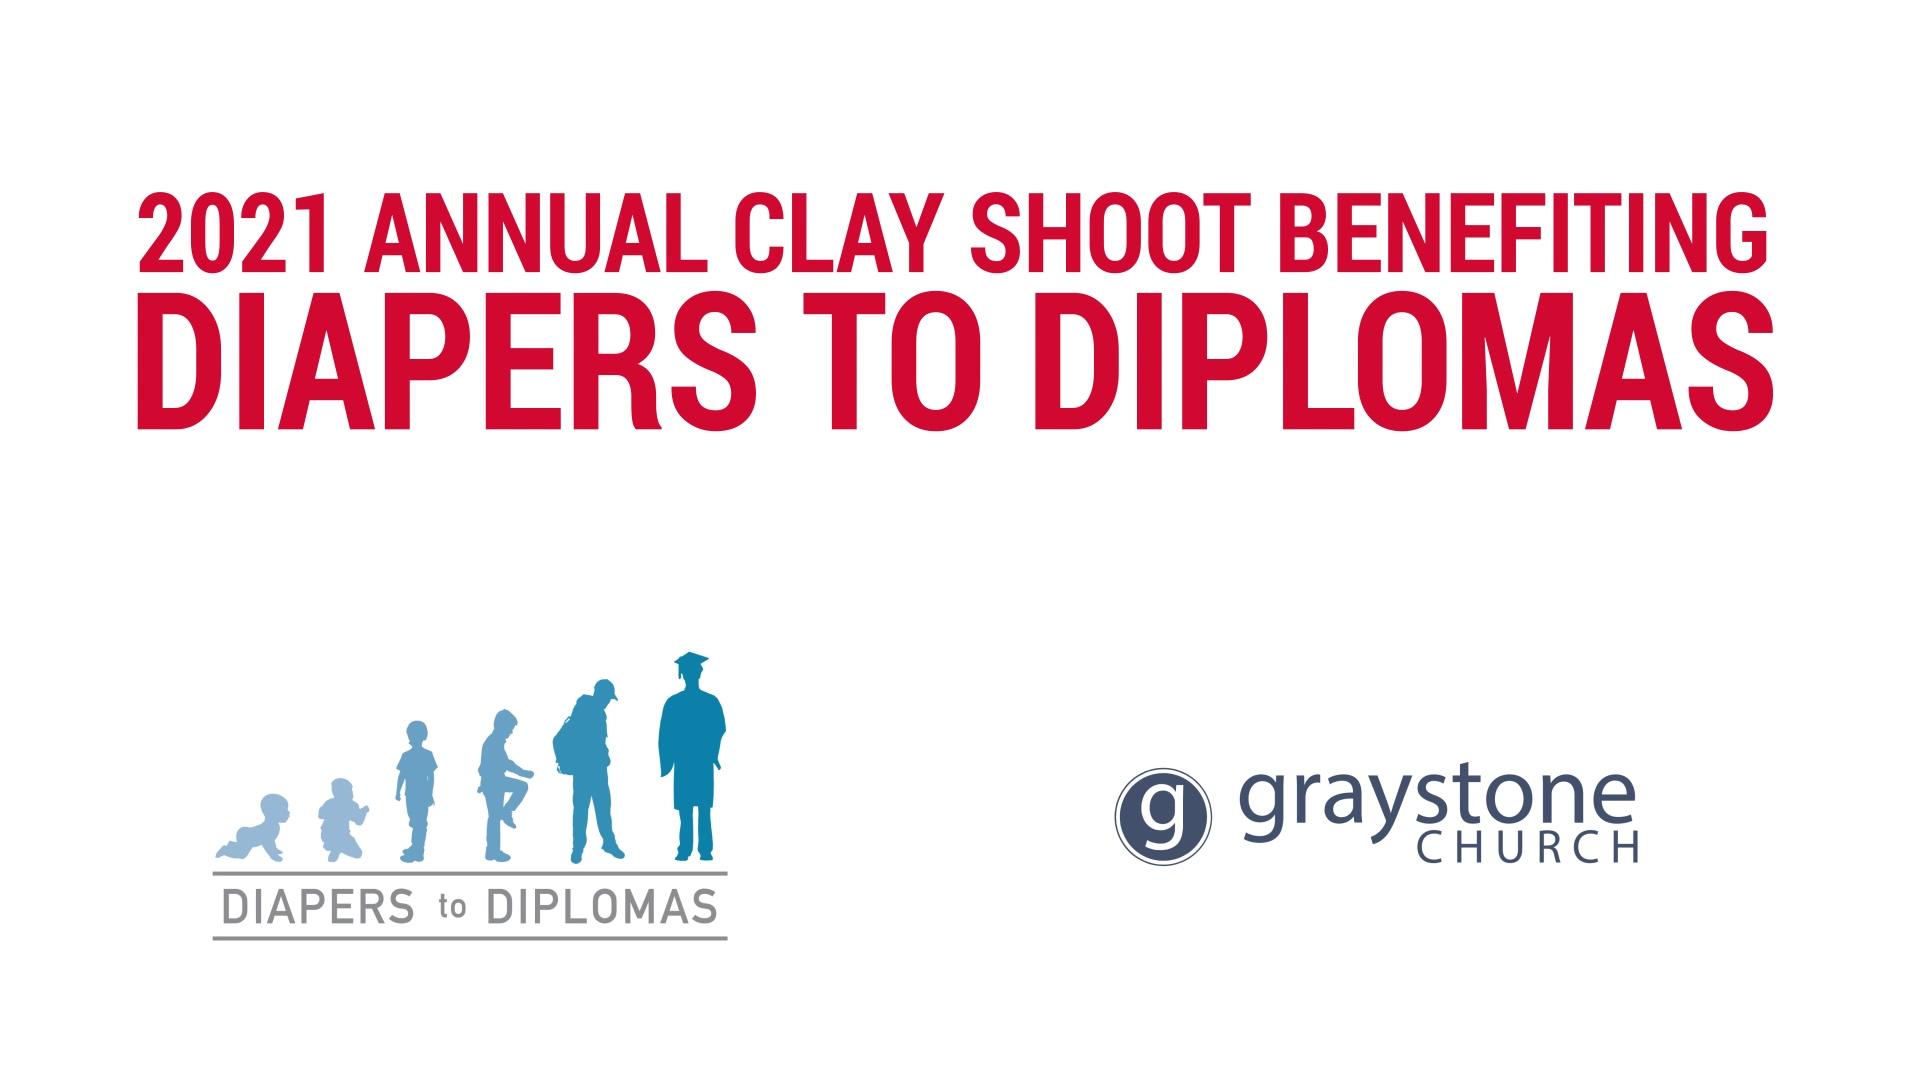 2021 Clay Shoot Hype Video